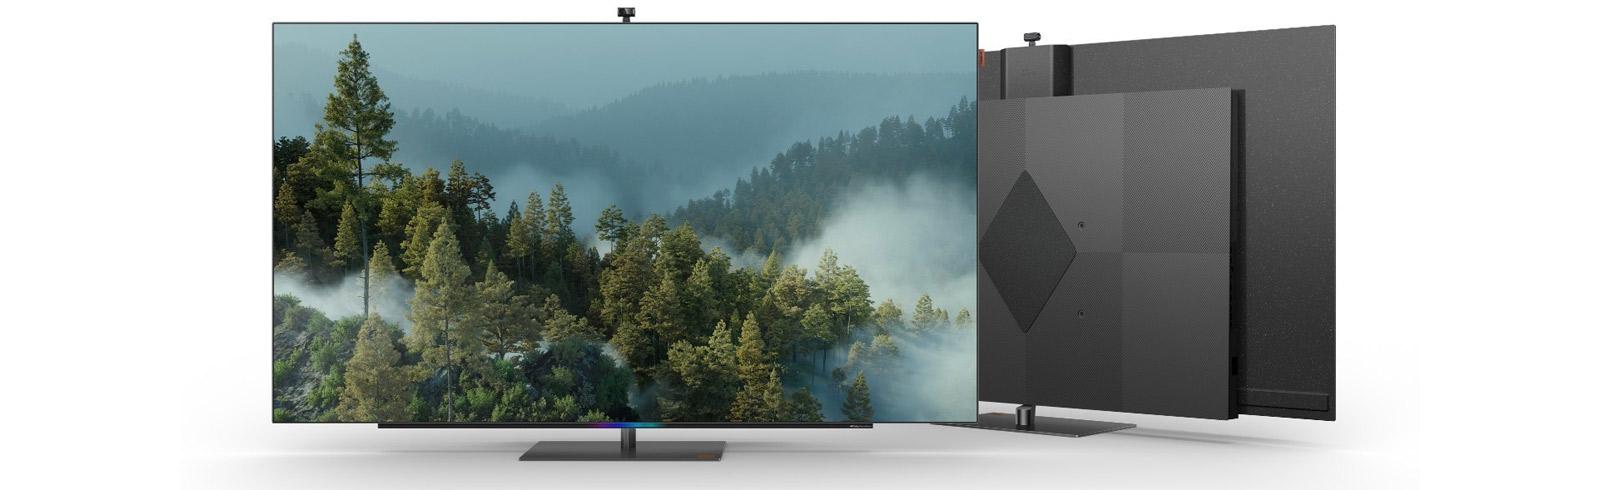 "The Skyworth G90 48"" 4K OLED, Skyworth Q72 Mini LED TV, Skyworth S82 OLED TVs and A20 Pro TVs go on sale"